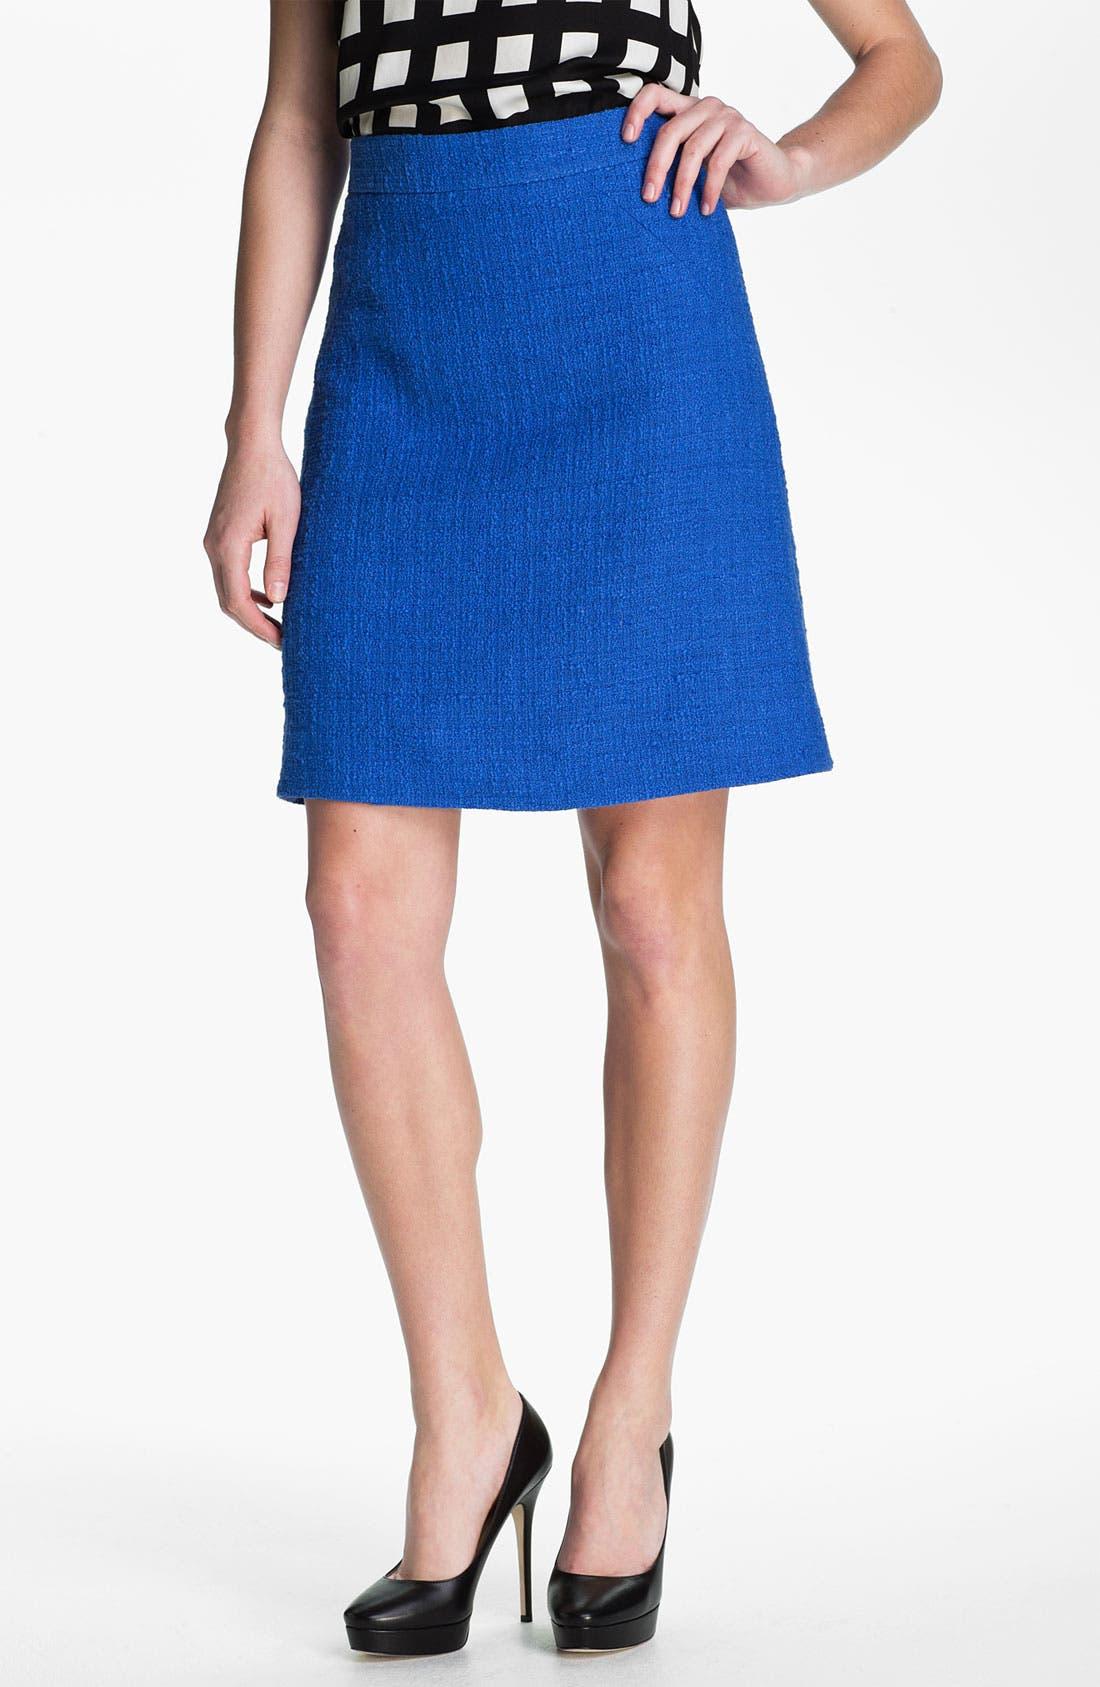 Alternate Image 1 Selected - kate spade new york 'anita' skirt